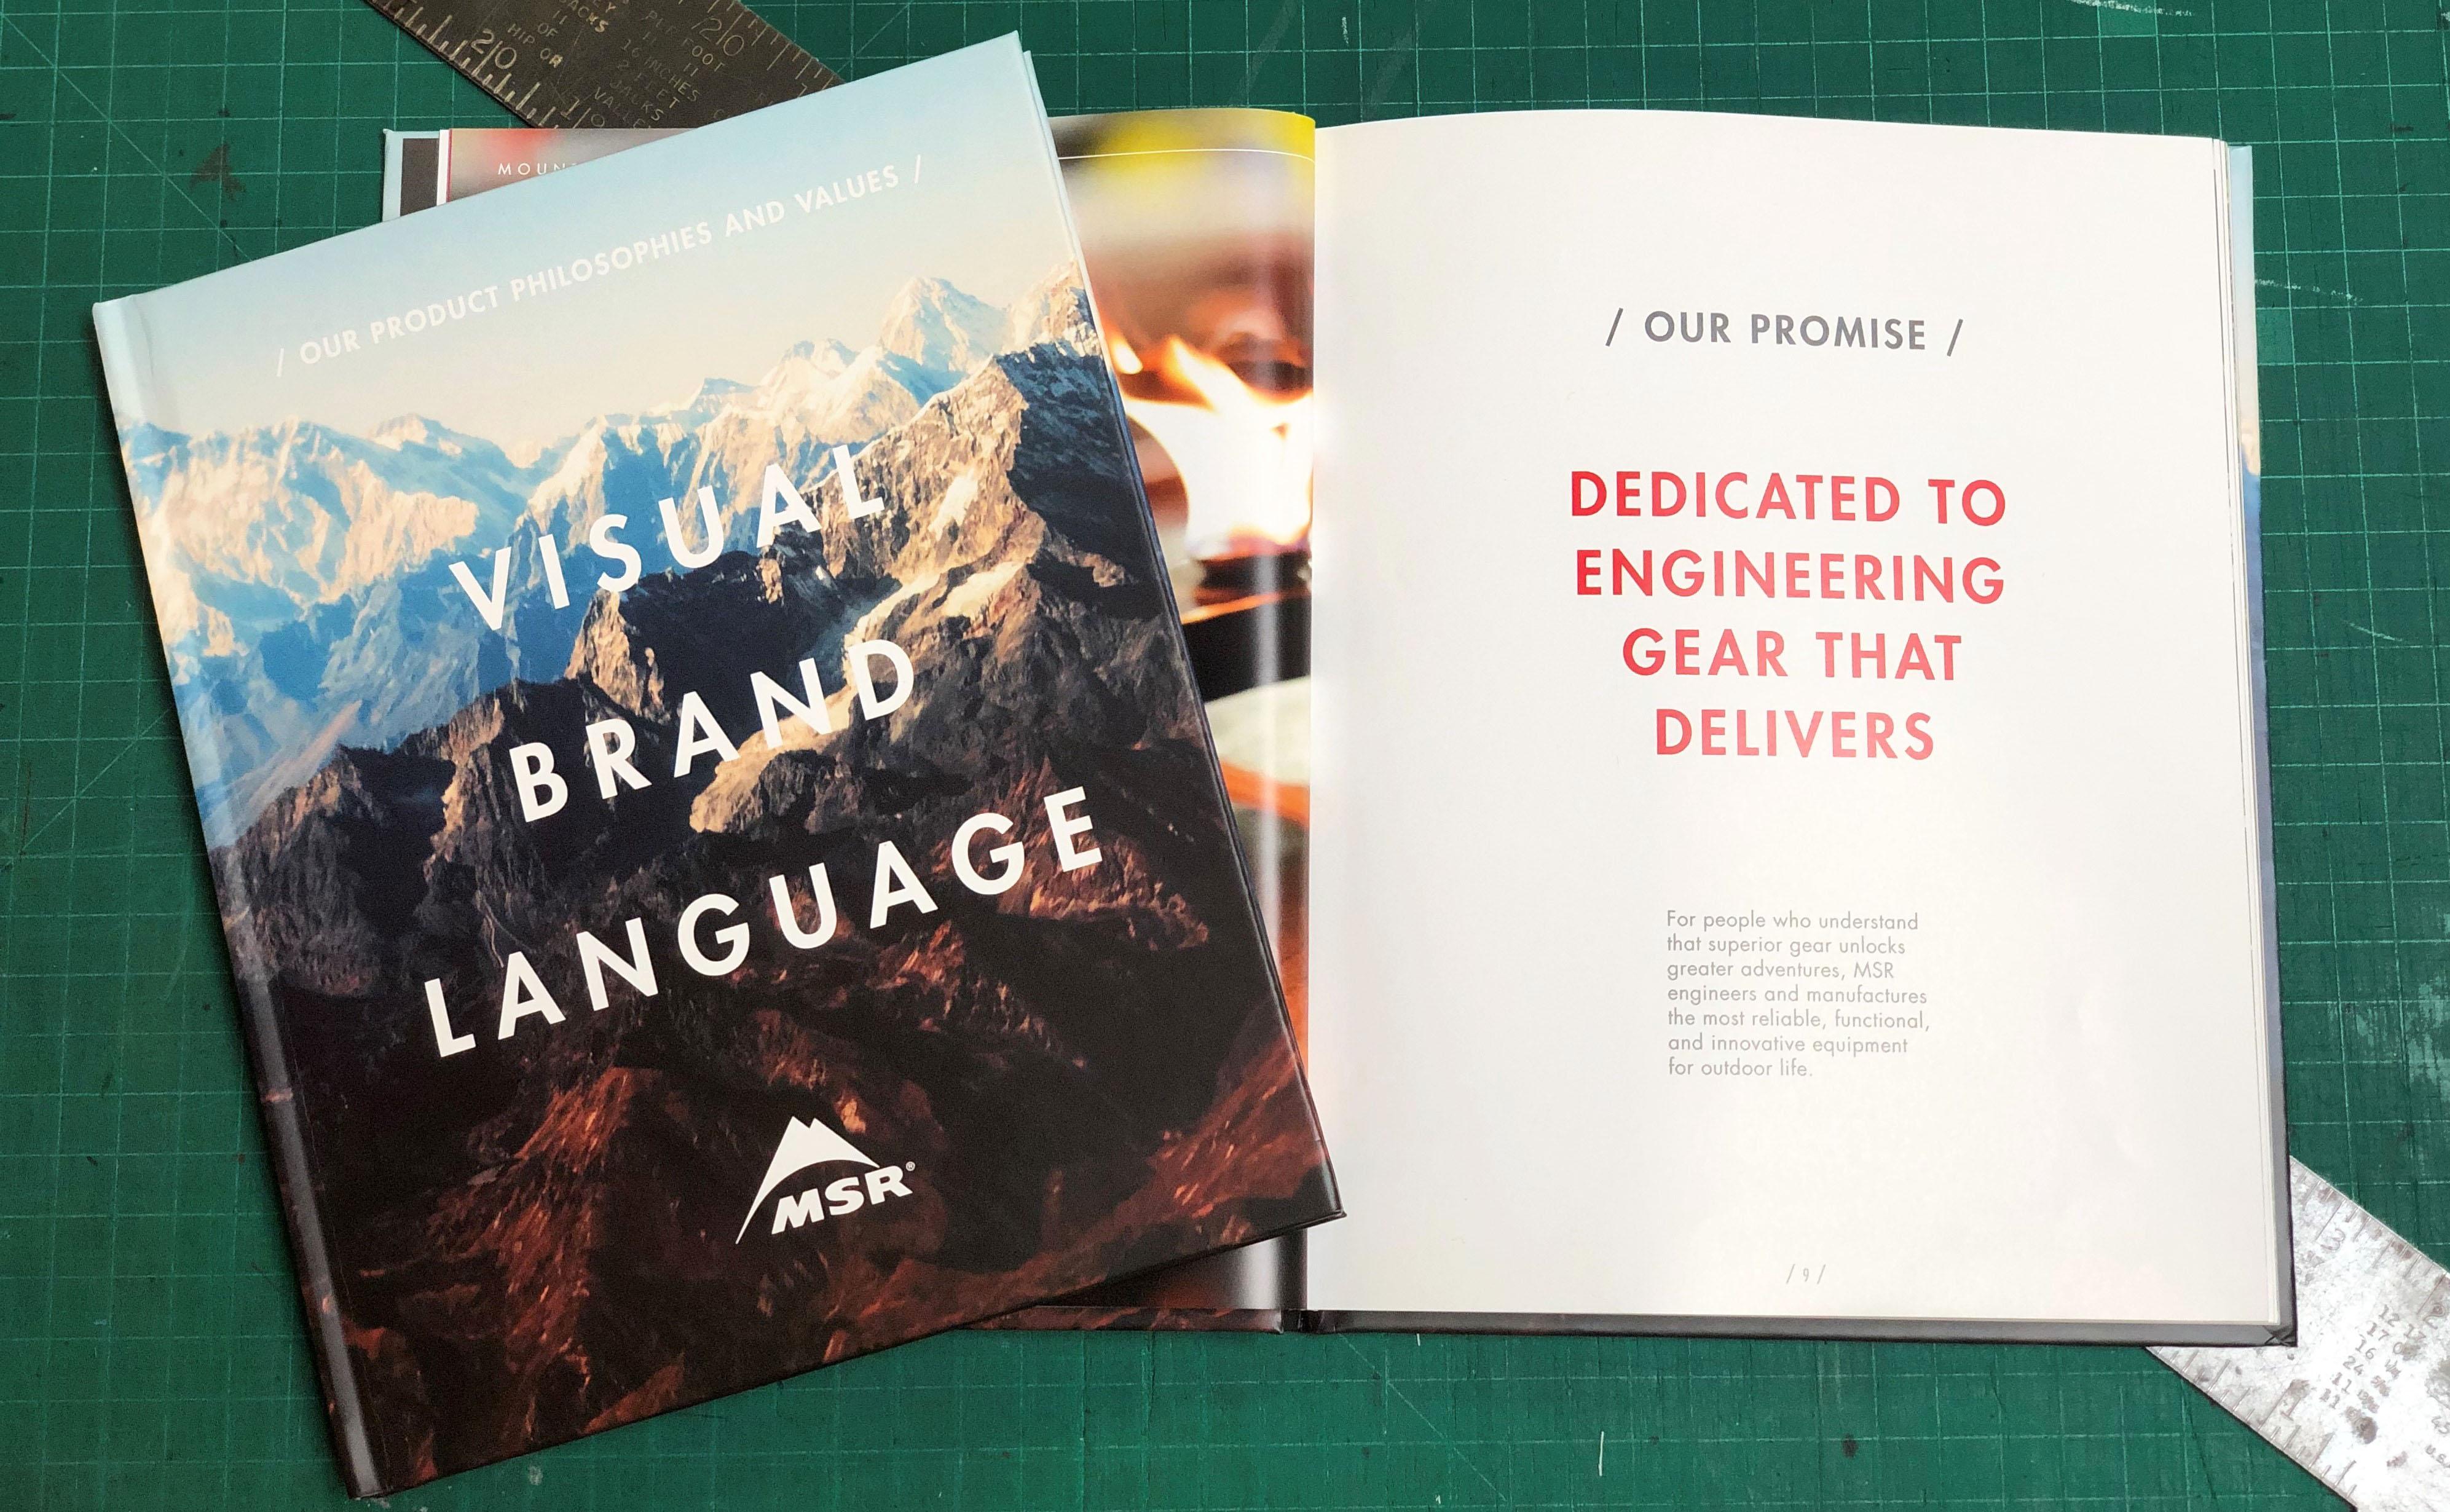 MSR visual brand language book